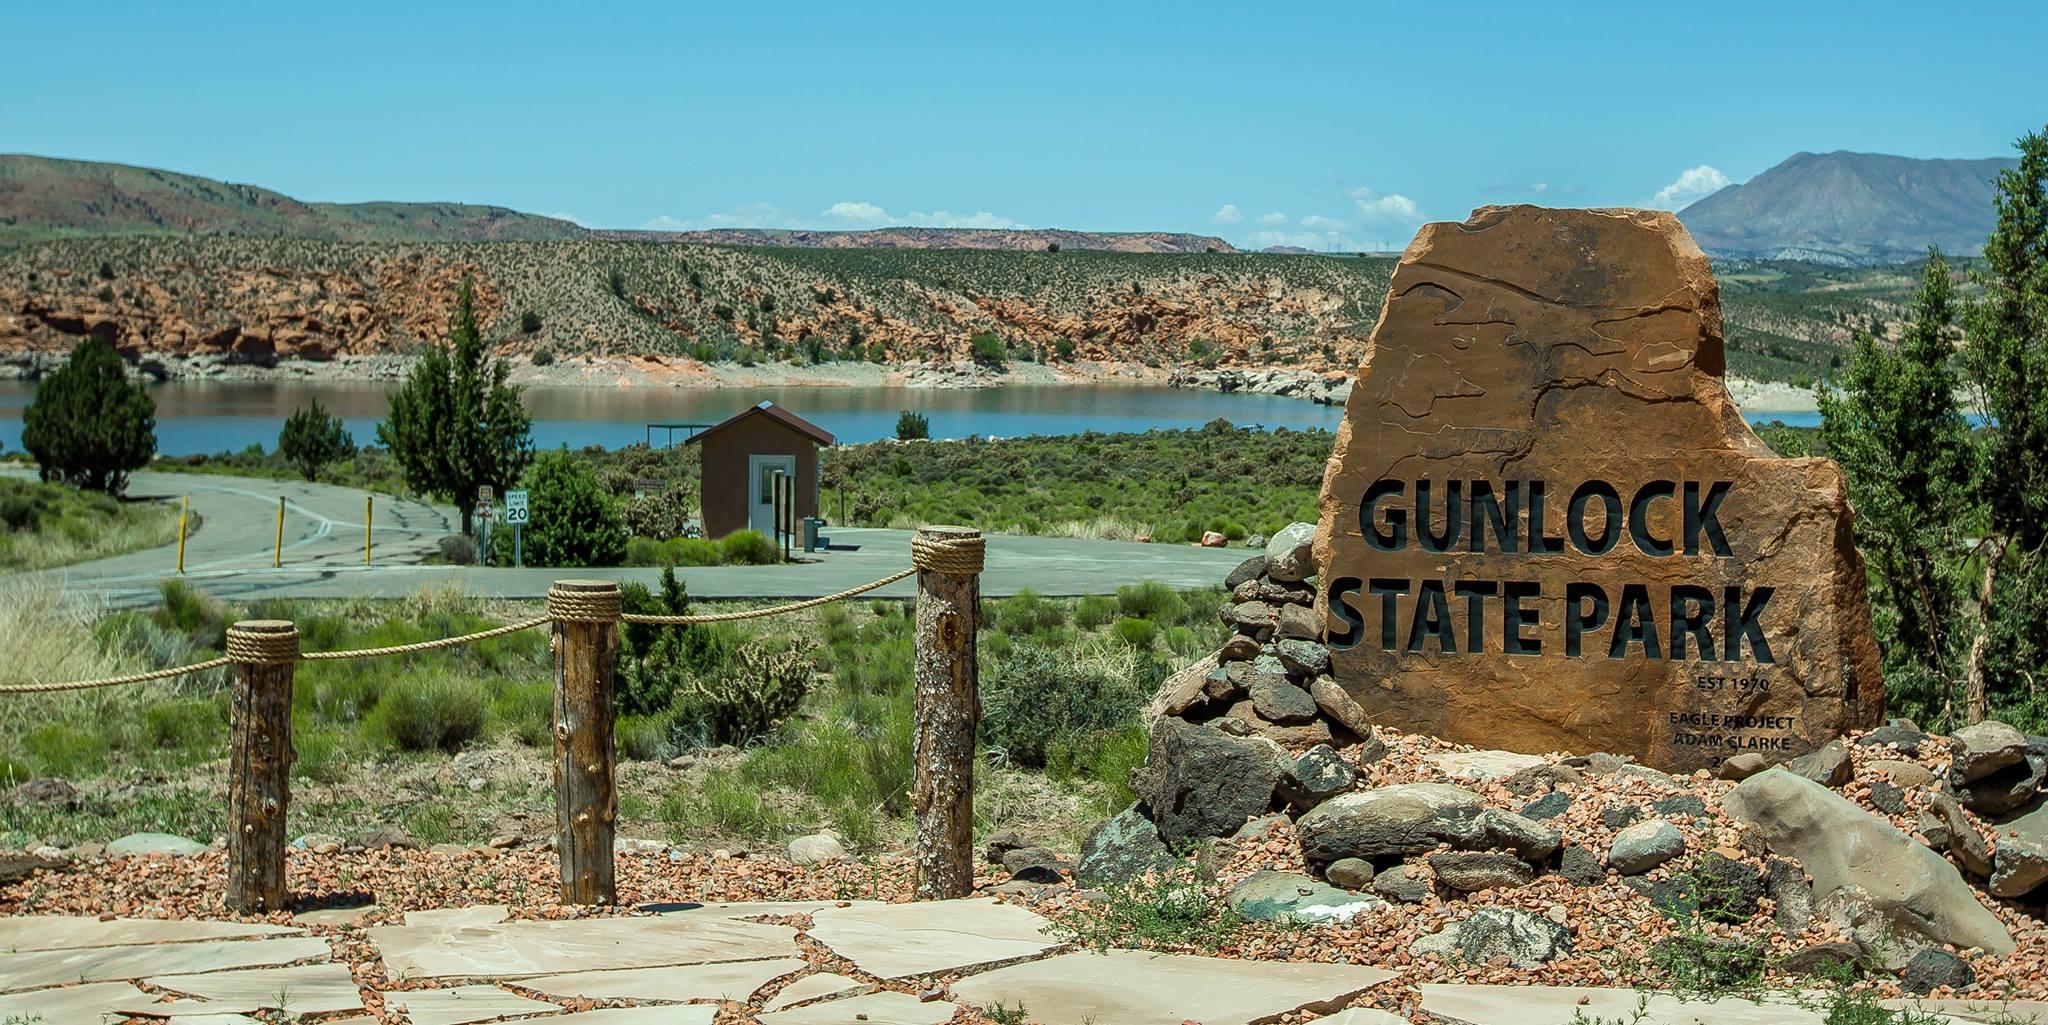 Gunlock State Park